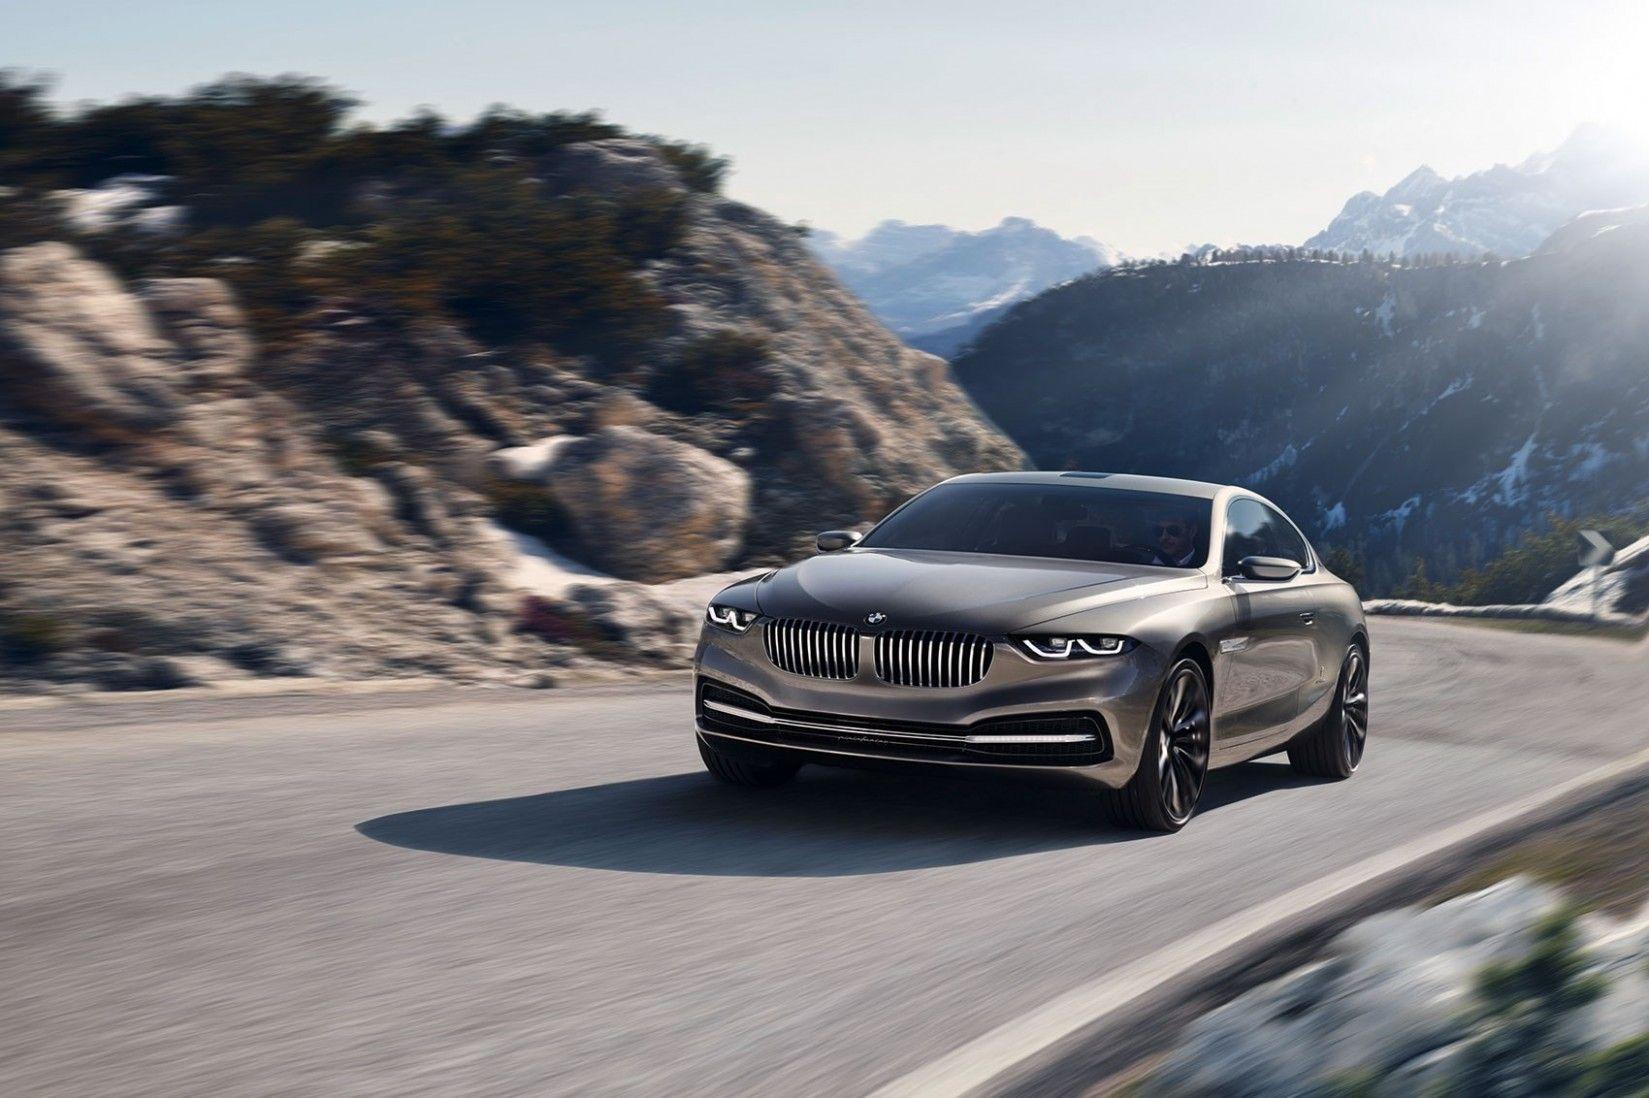 2021 BMW M9 Pricing